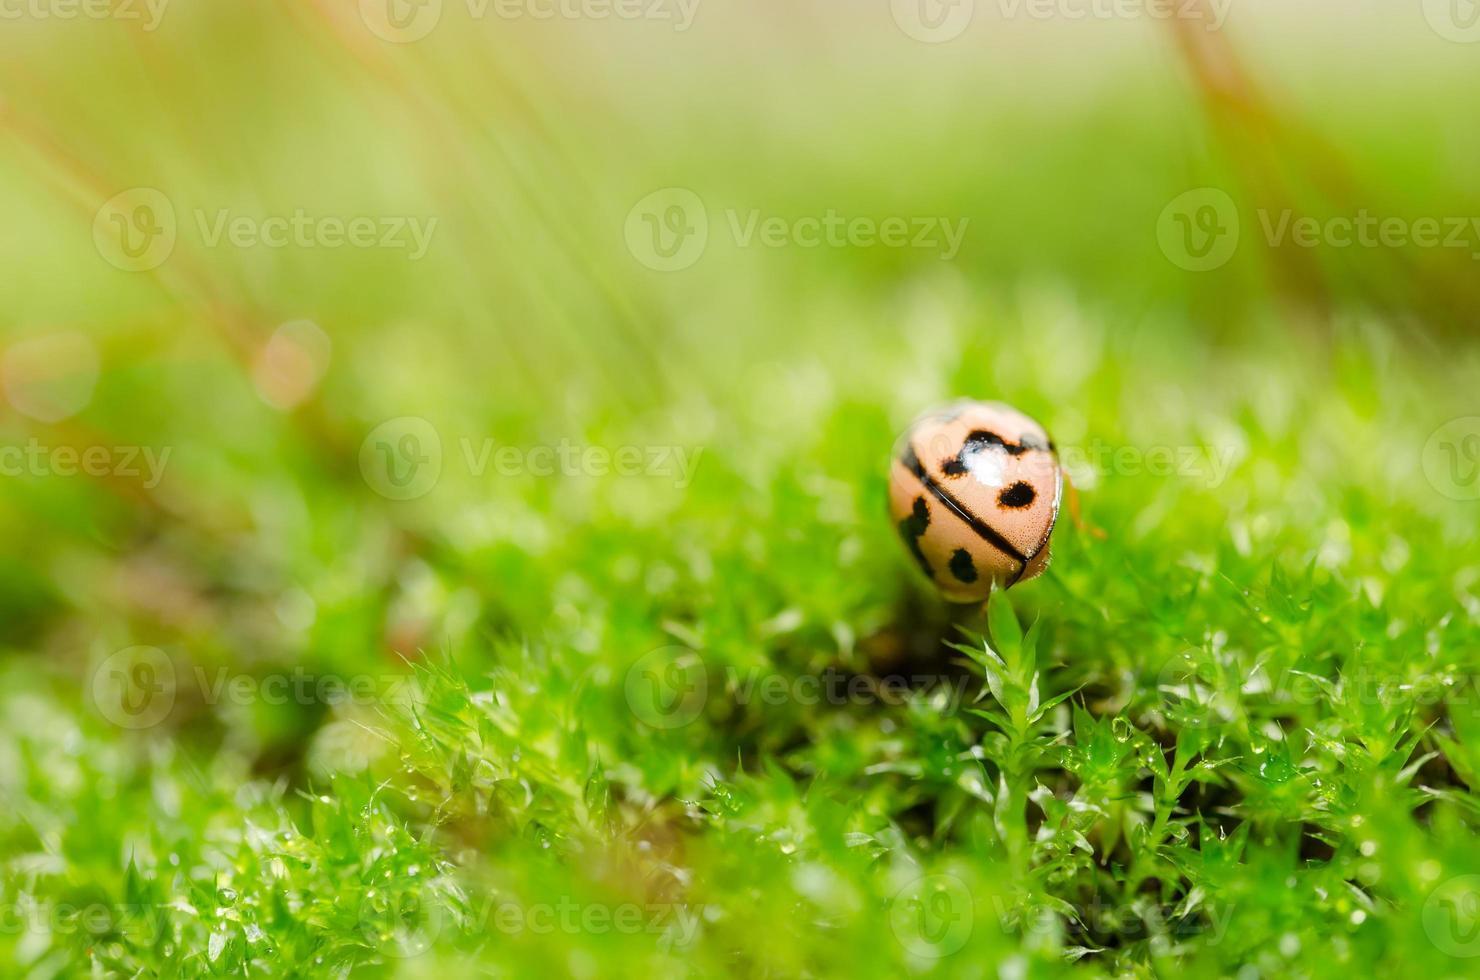 mariquita en la naturaleza verde foto